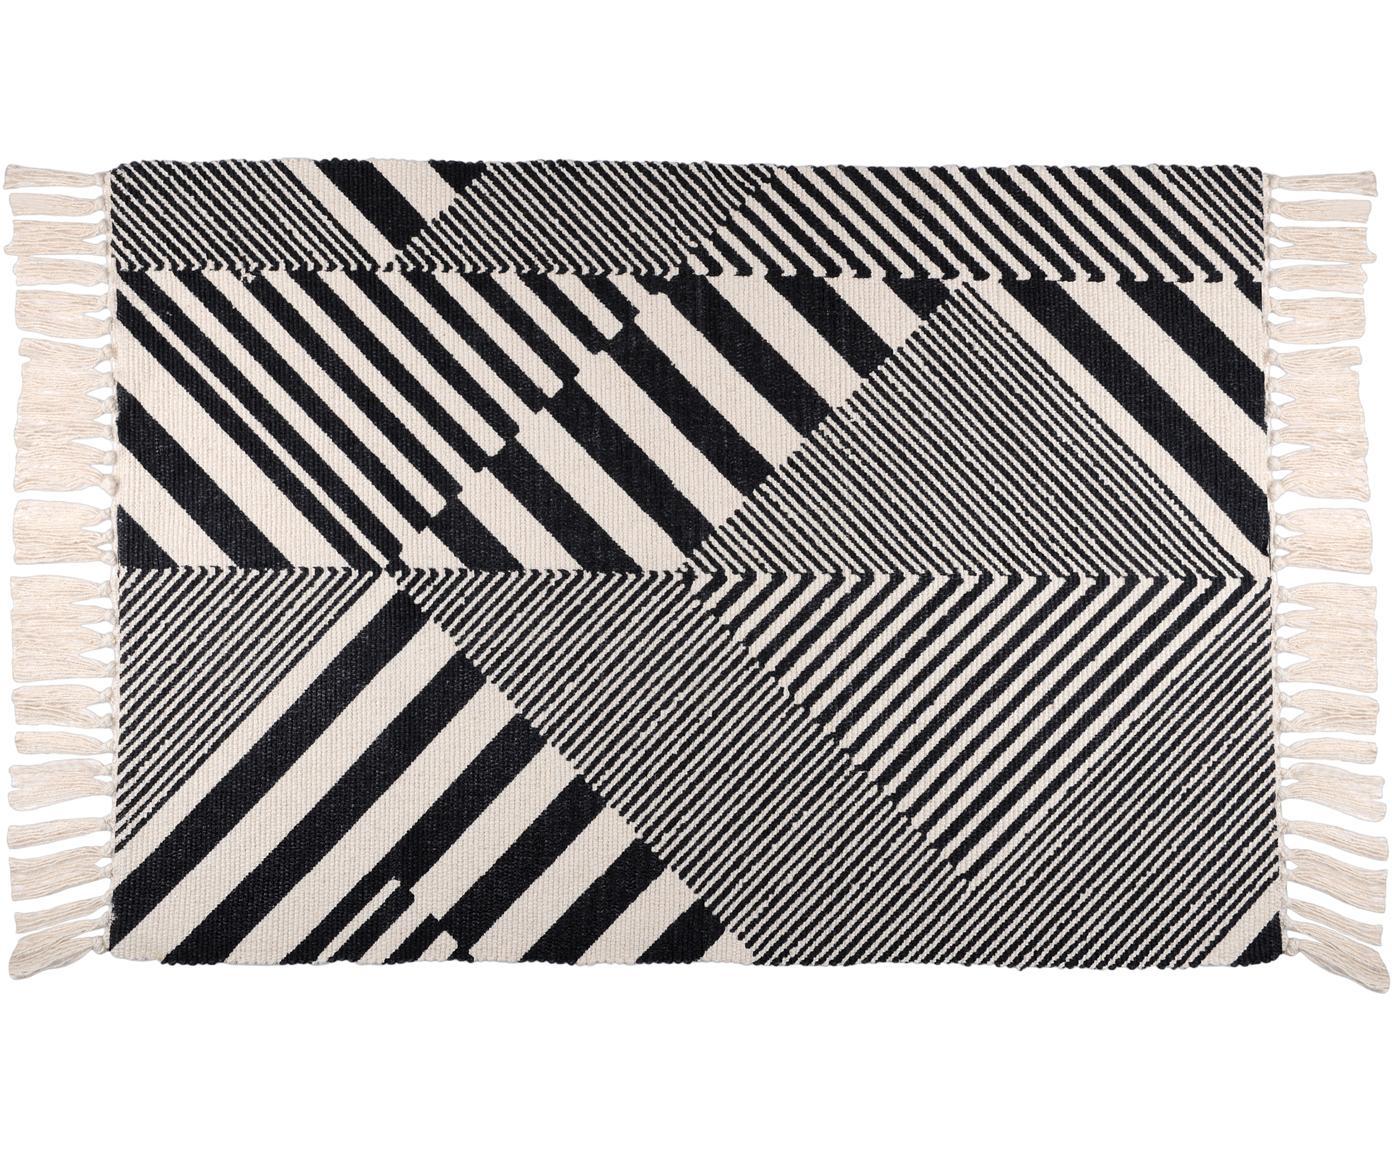 Alfombra algodón Beely, Algodón, Negro, blanco crudo, An 60 x L 90 cm (Tamaño XXS)